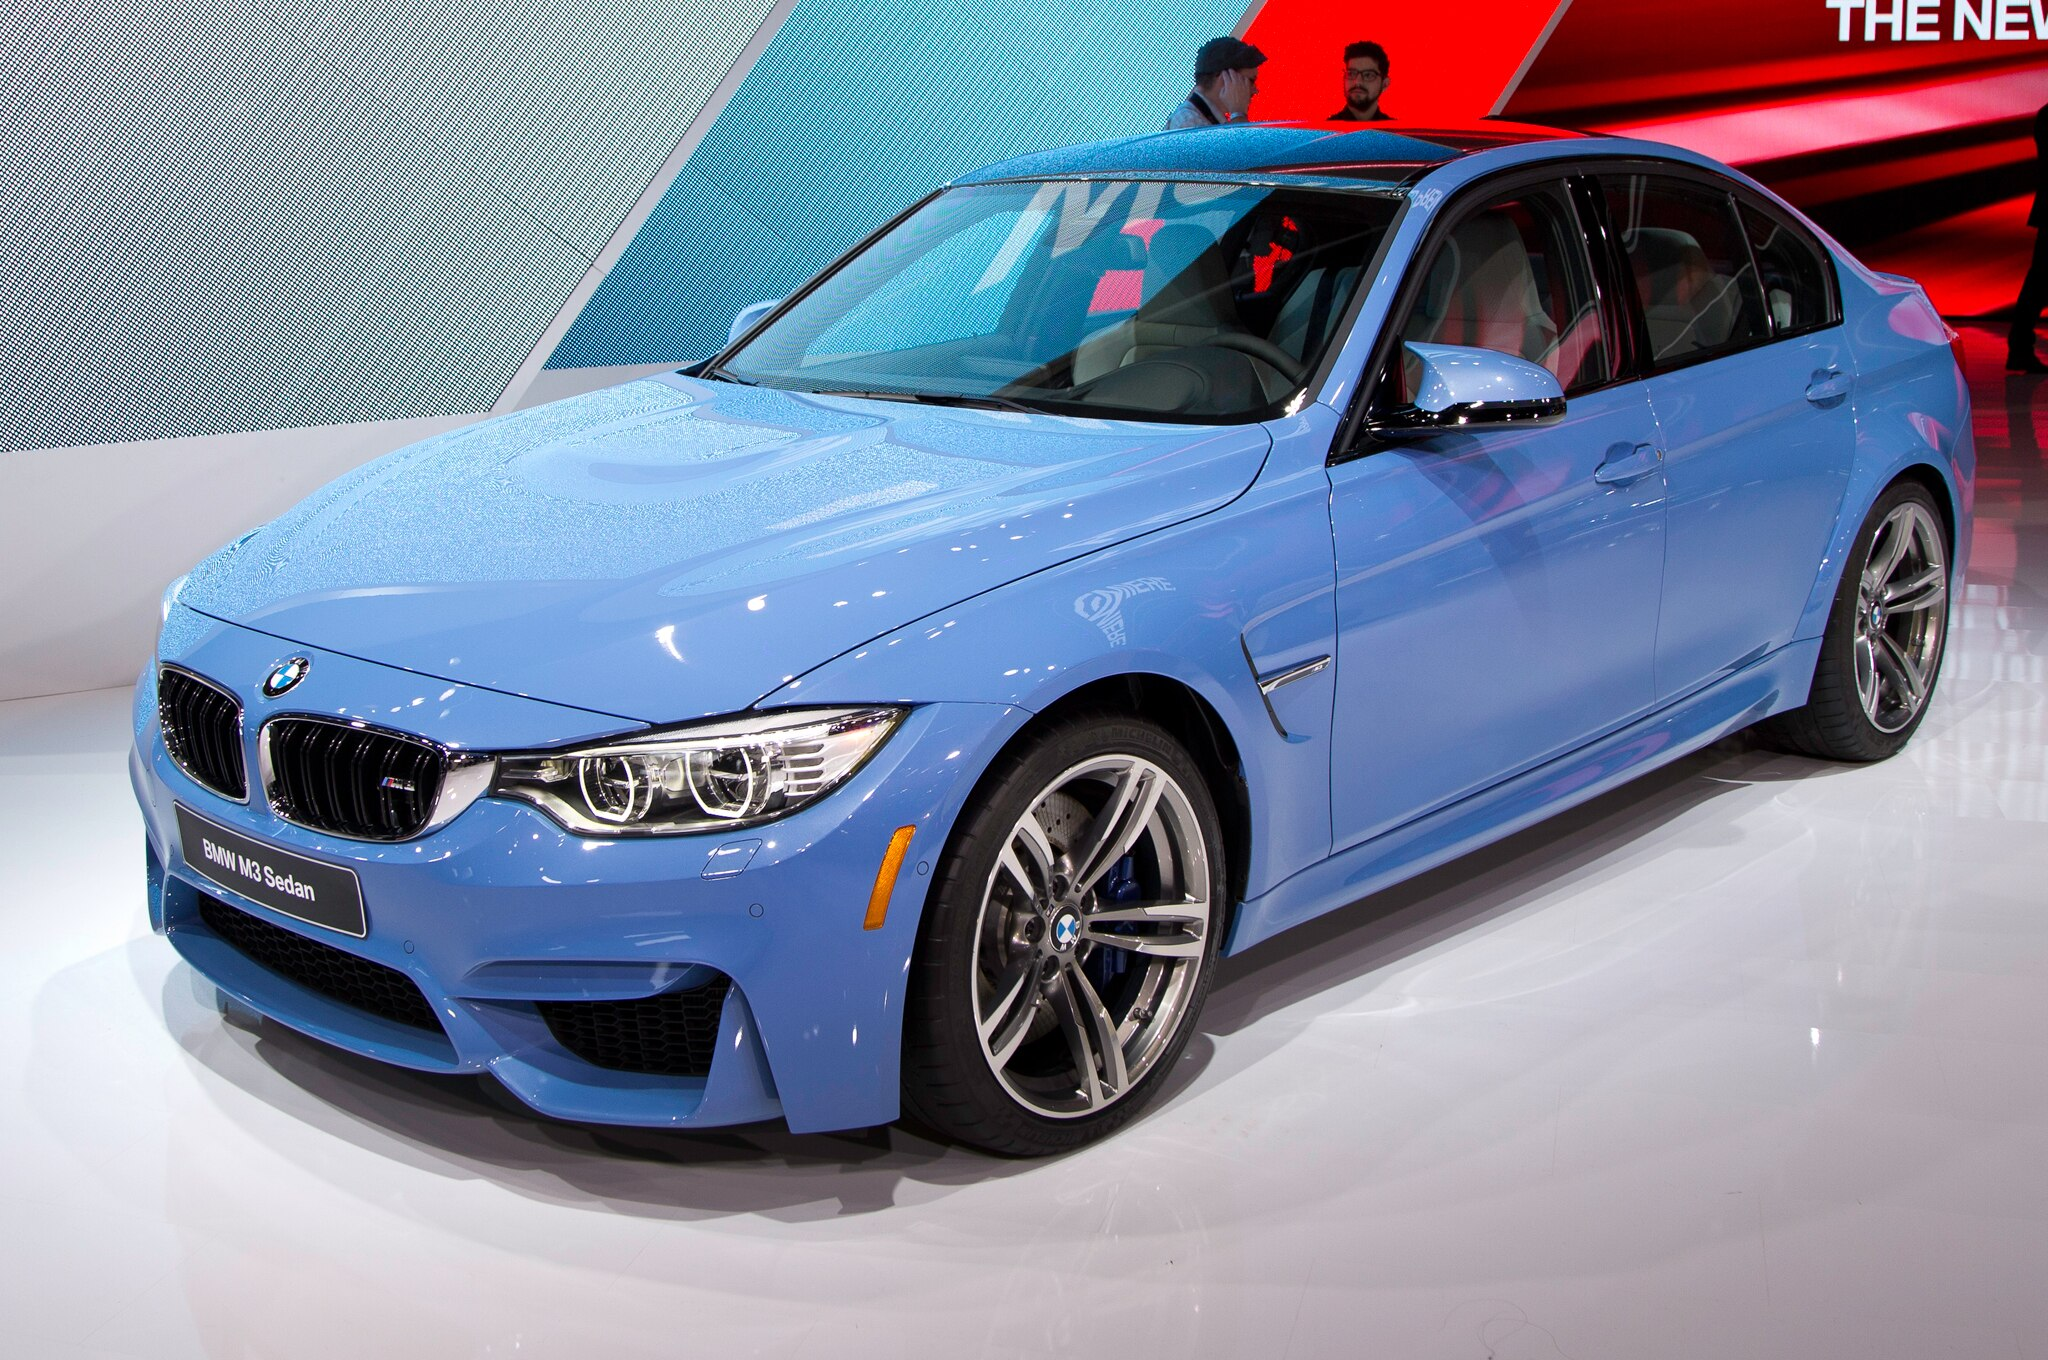 2015 BMW M3 Sedan Front Three Quarters1